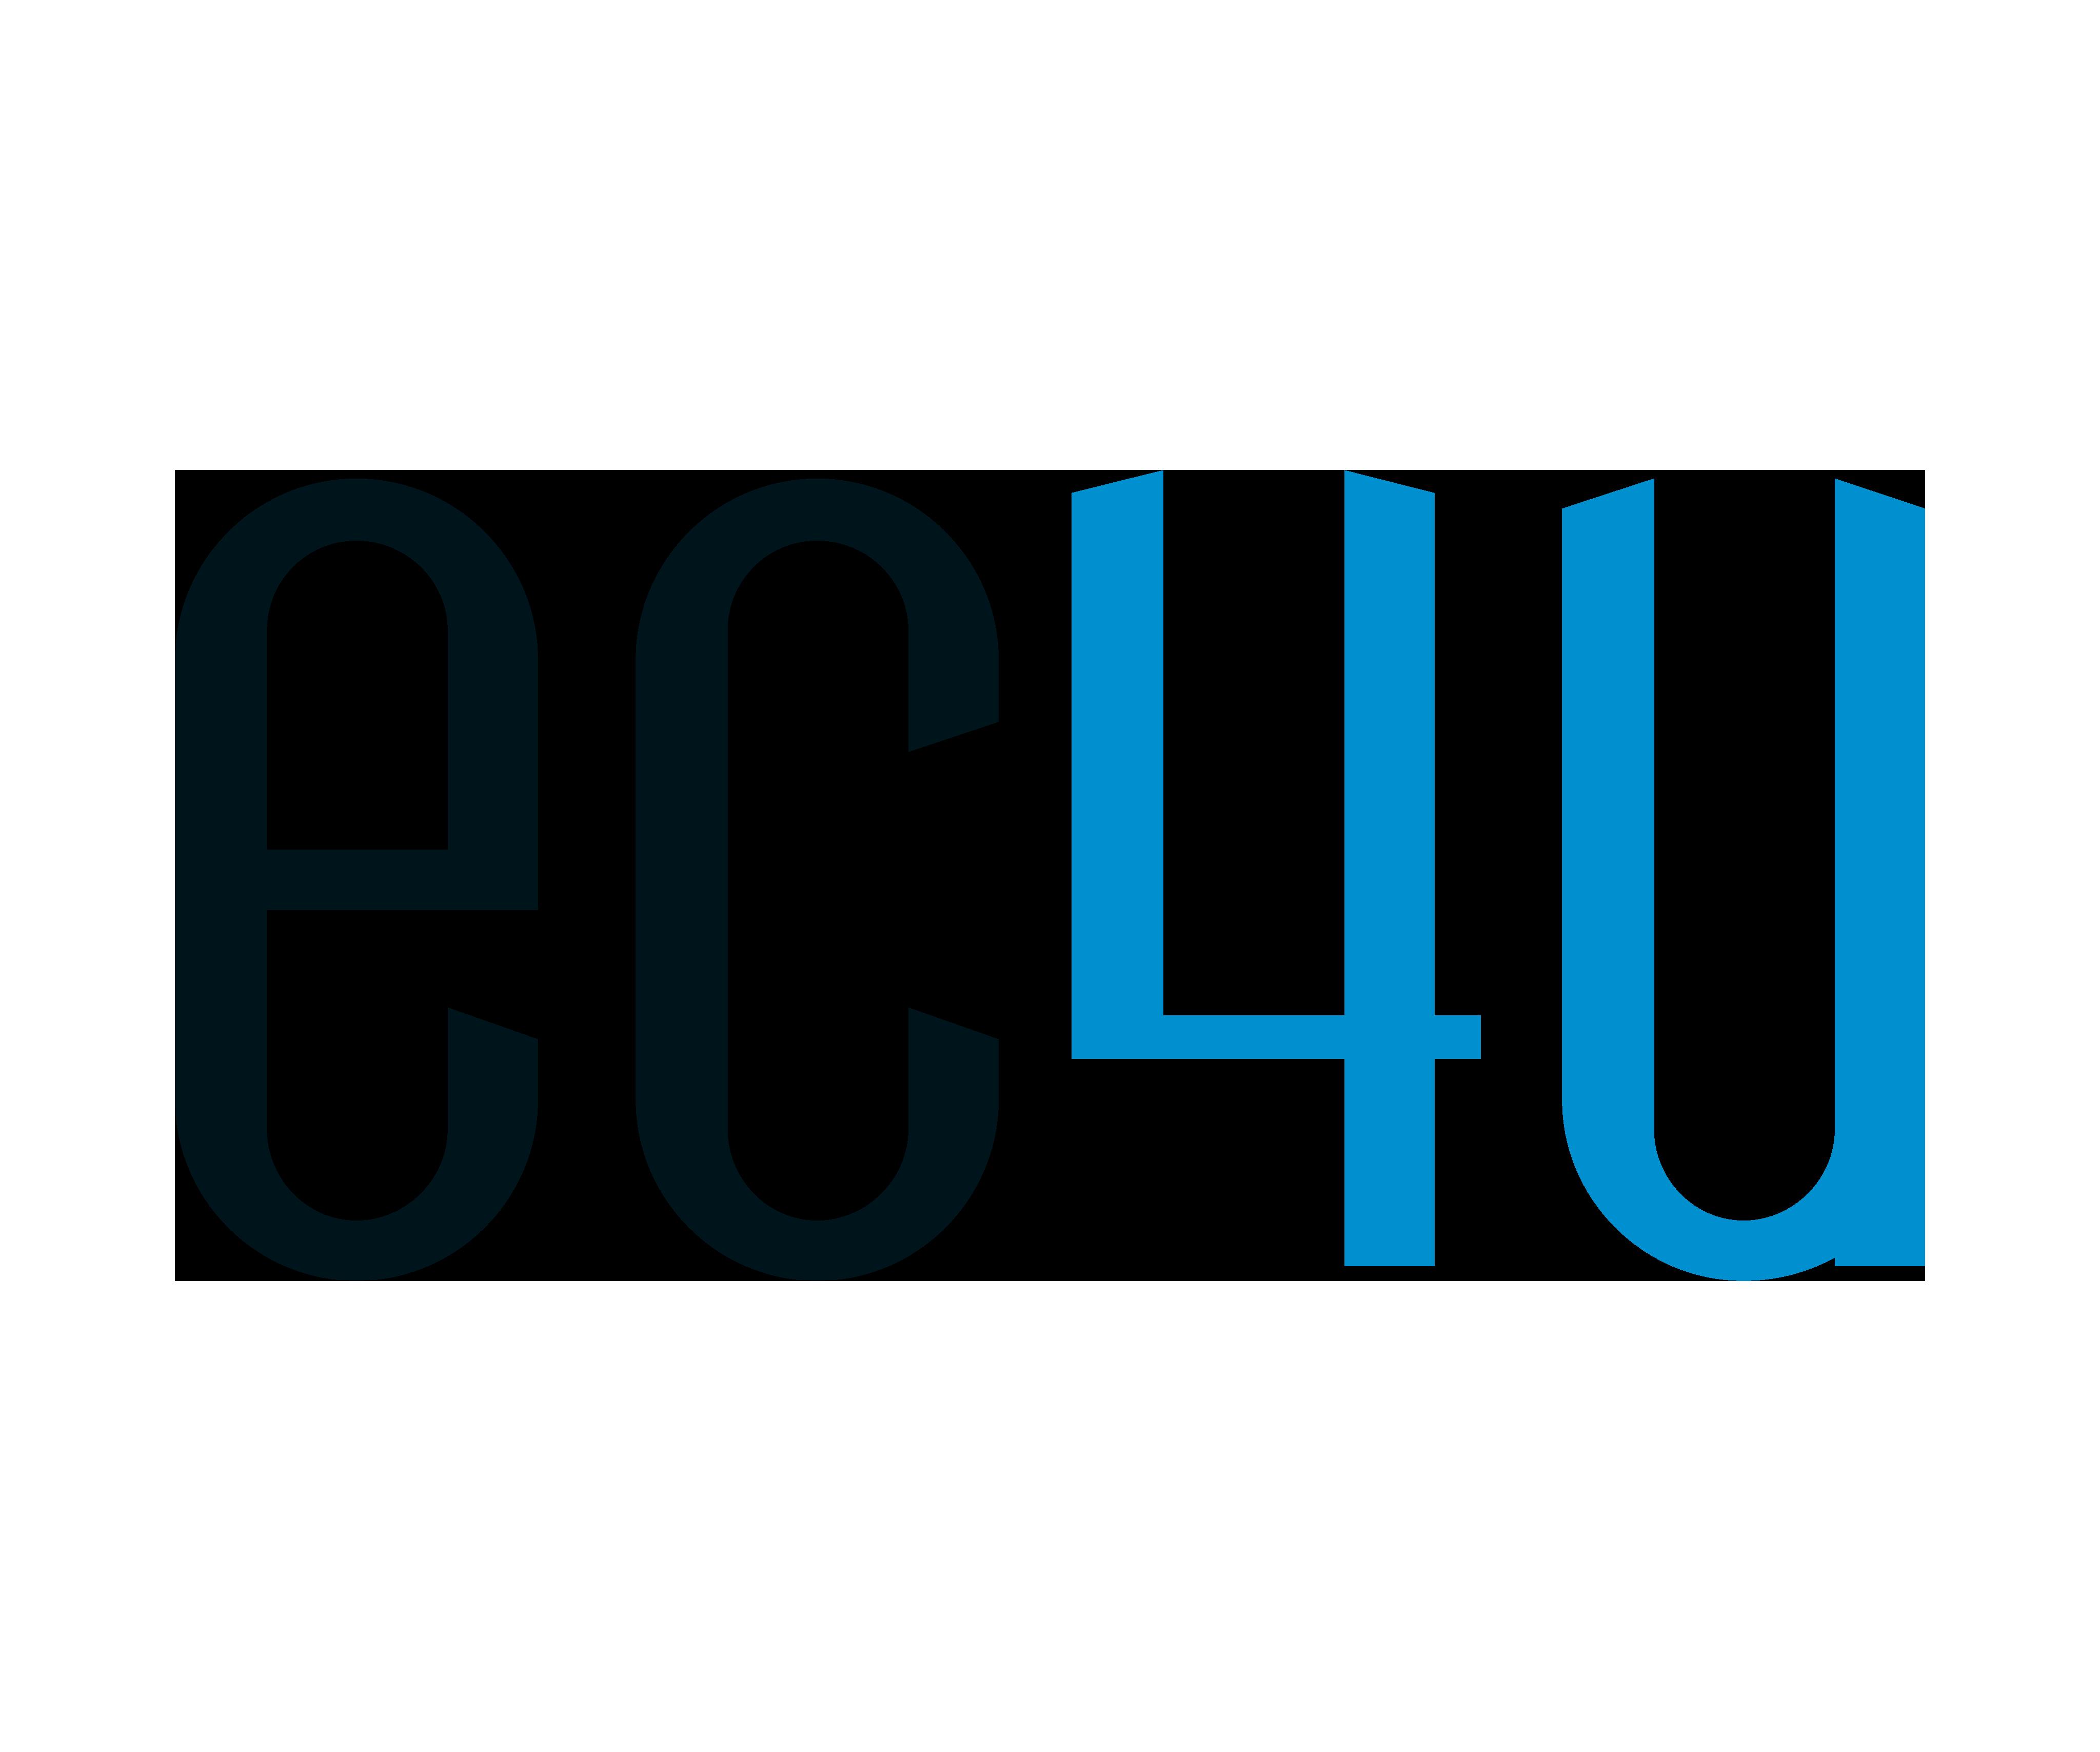 ec4u logo